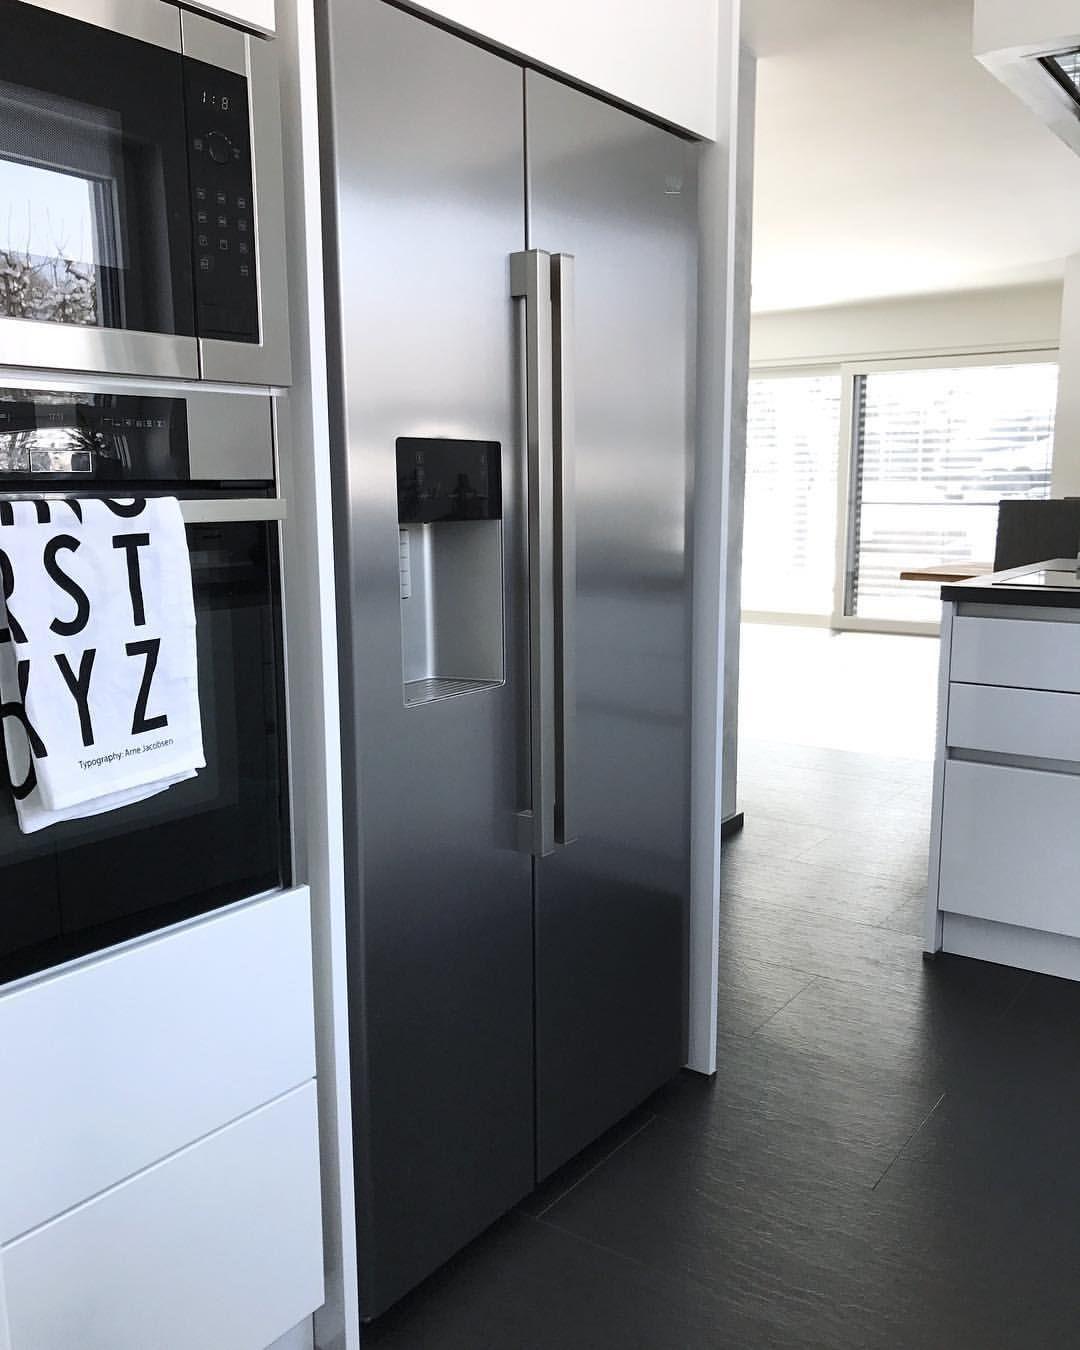 Küchenschrank In Wand Integriert